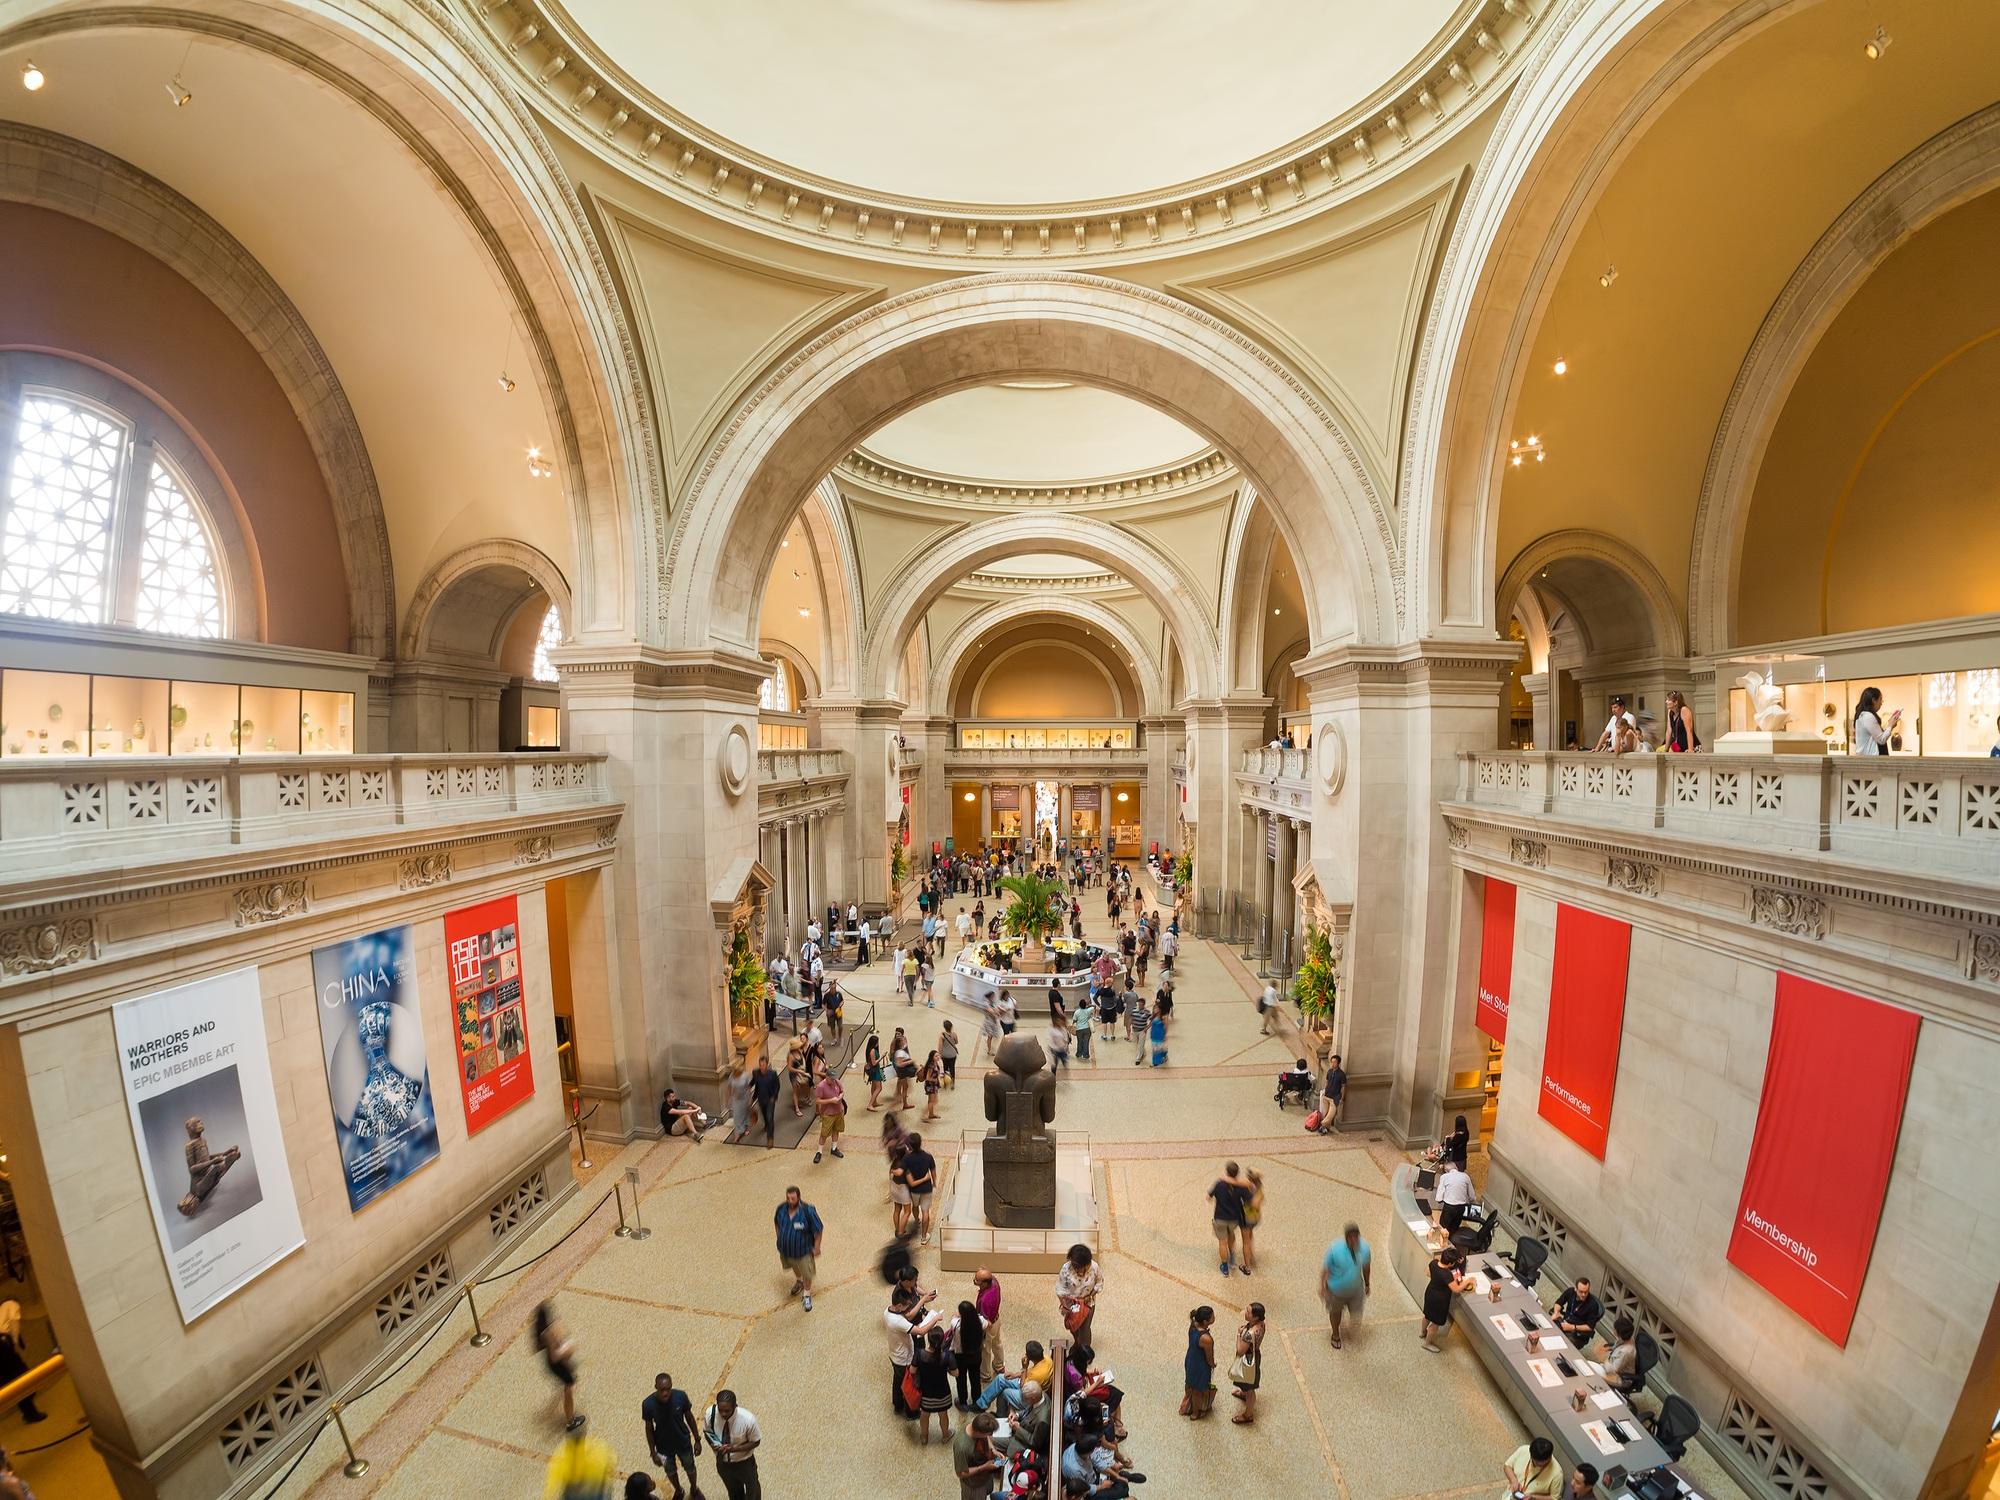 Metropolitan Museum of Art near Central Park